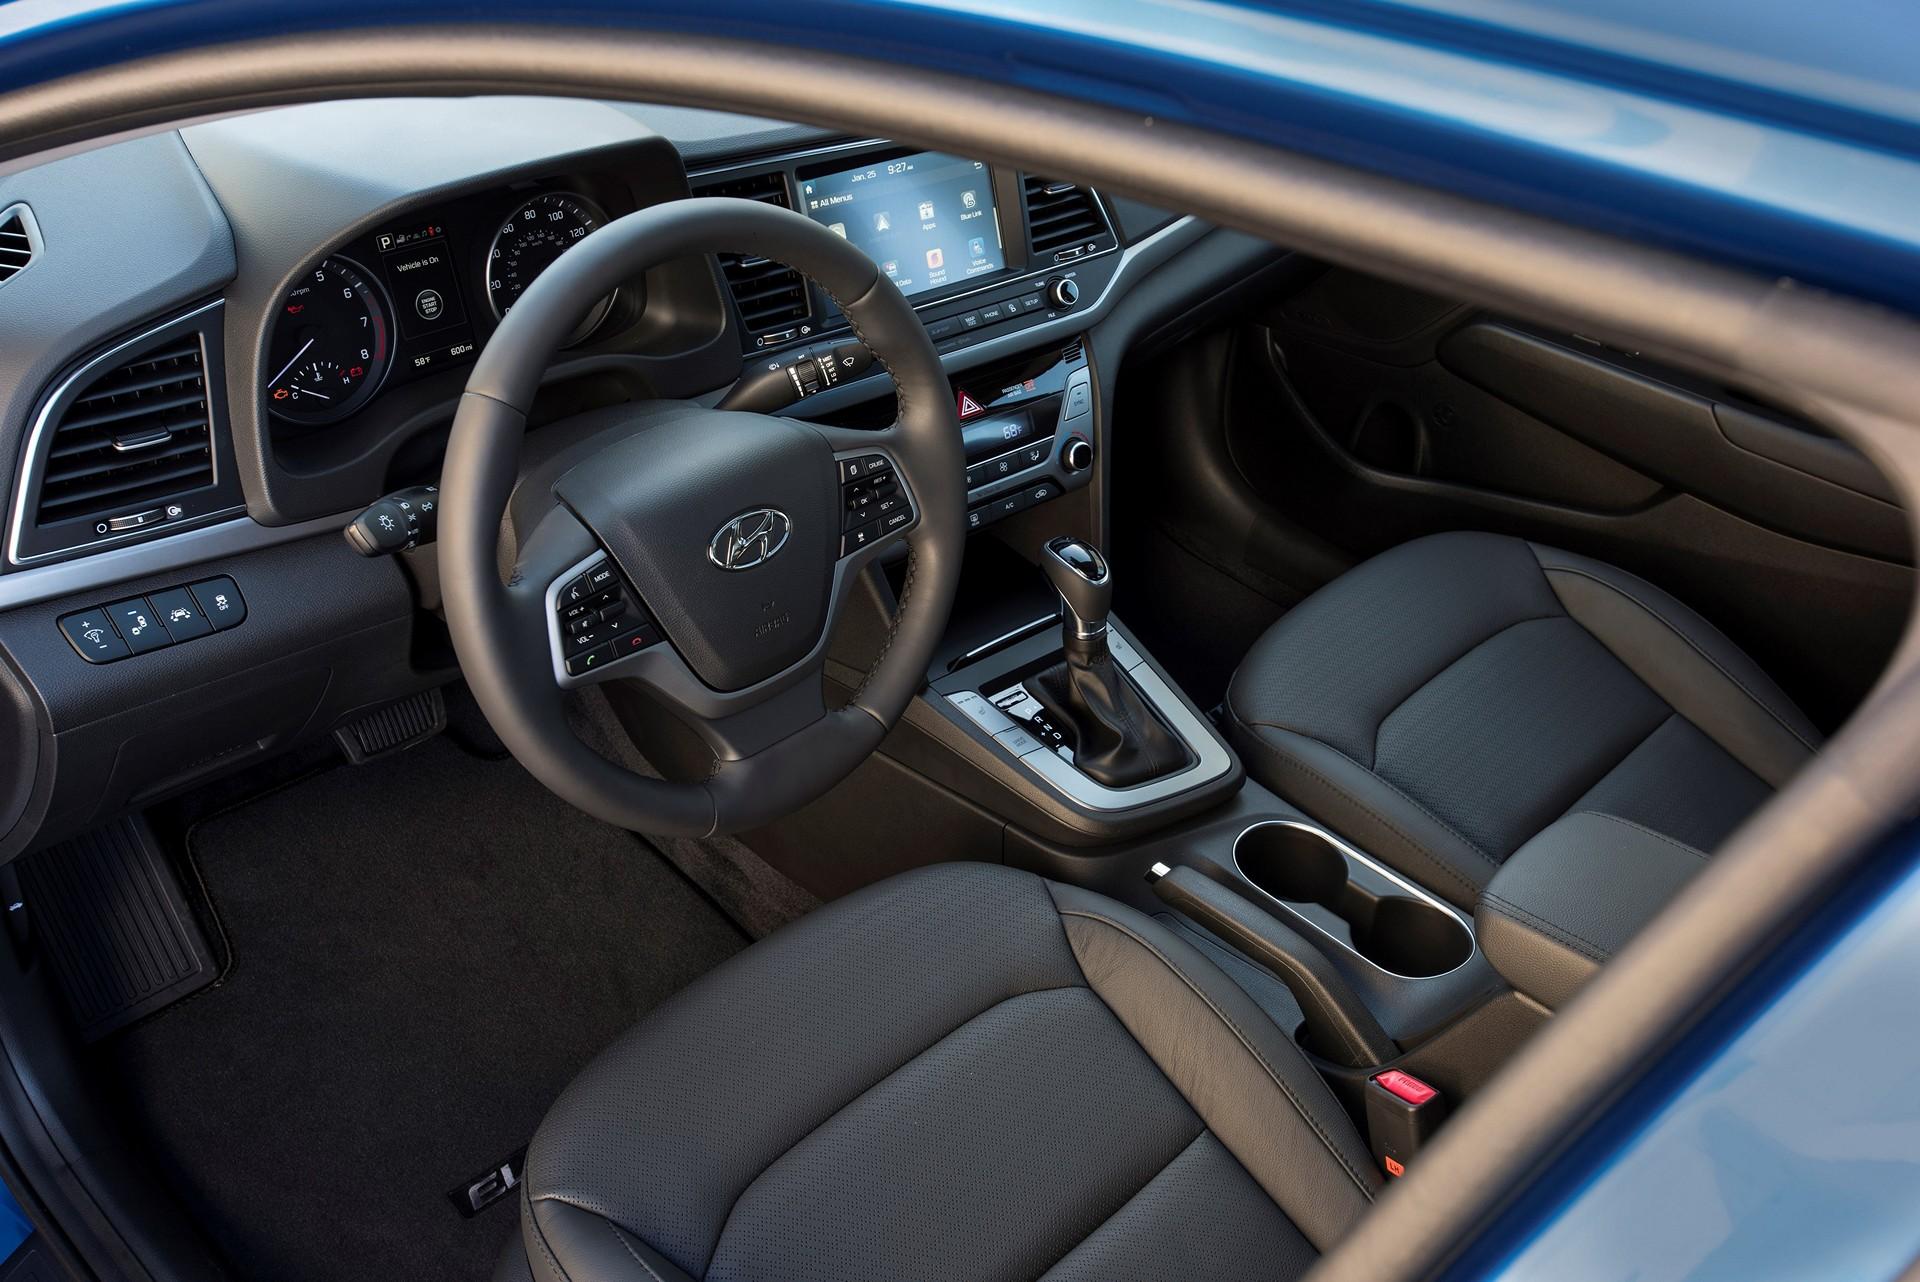 2017 hyundai elantra review carrrs auto portal. Black Bedroom Furniture Sets. Home Design Ideas